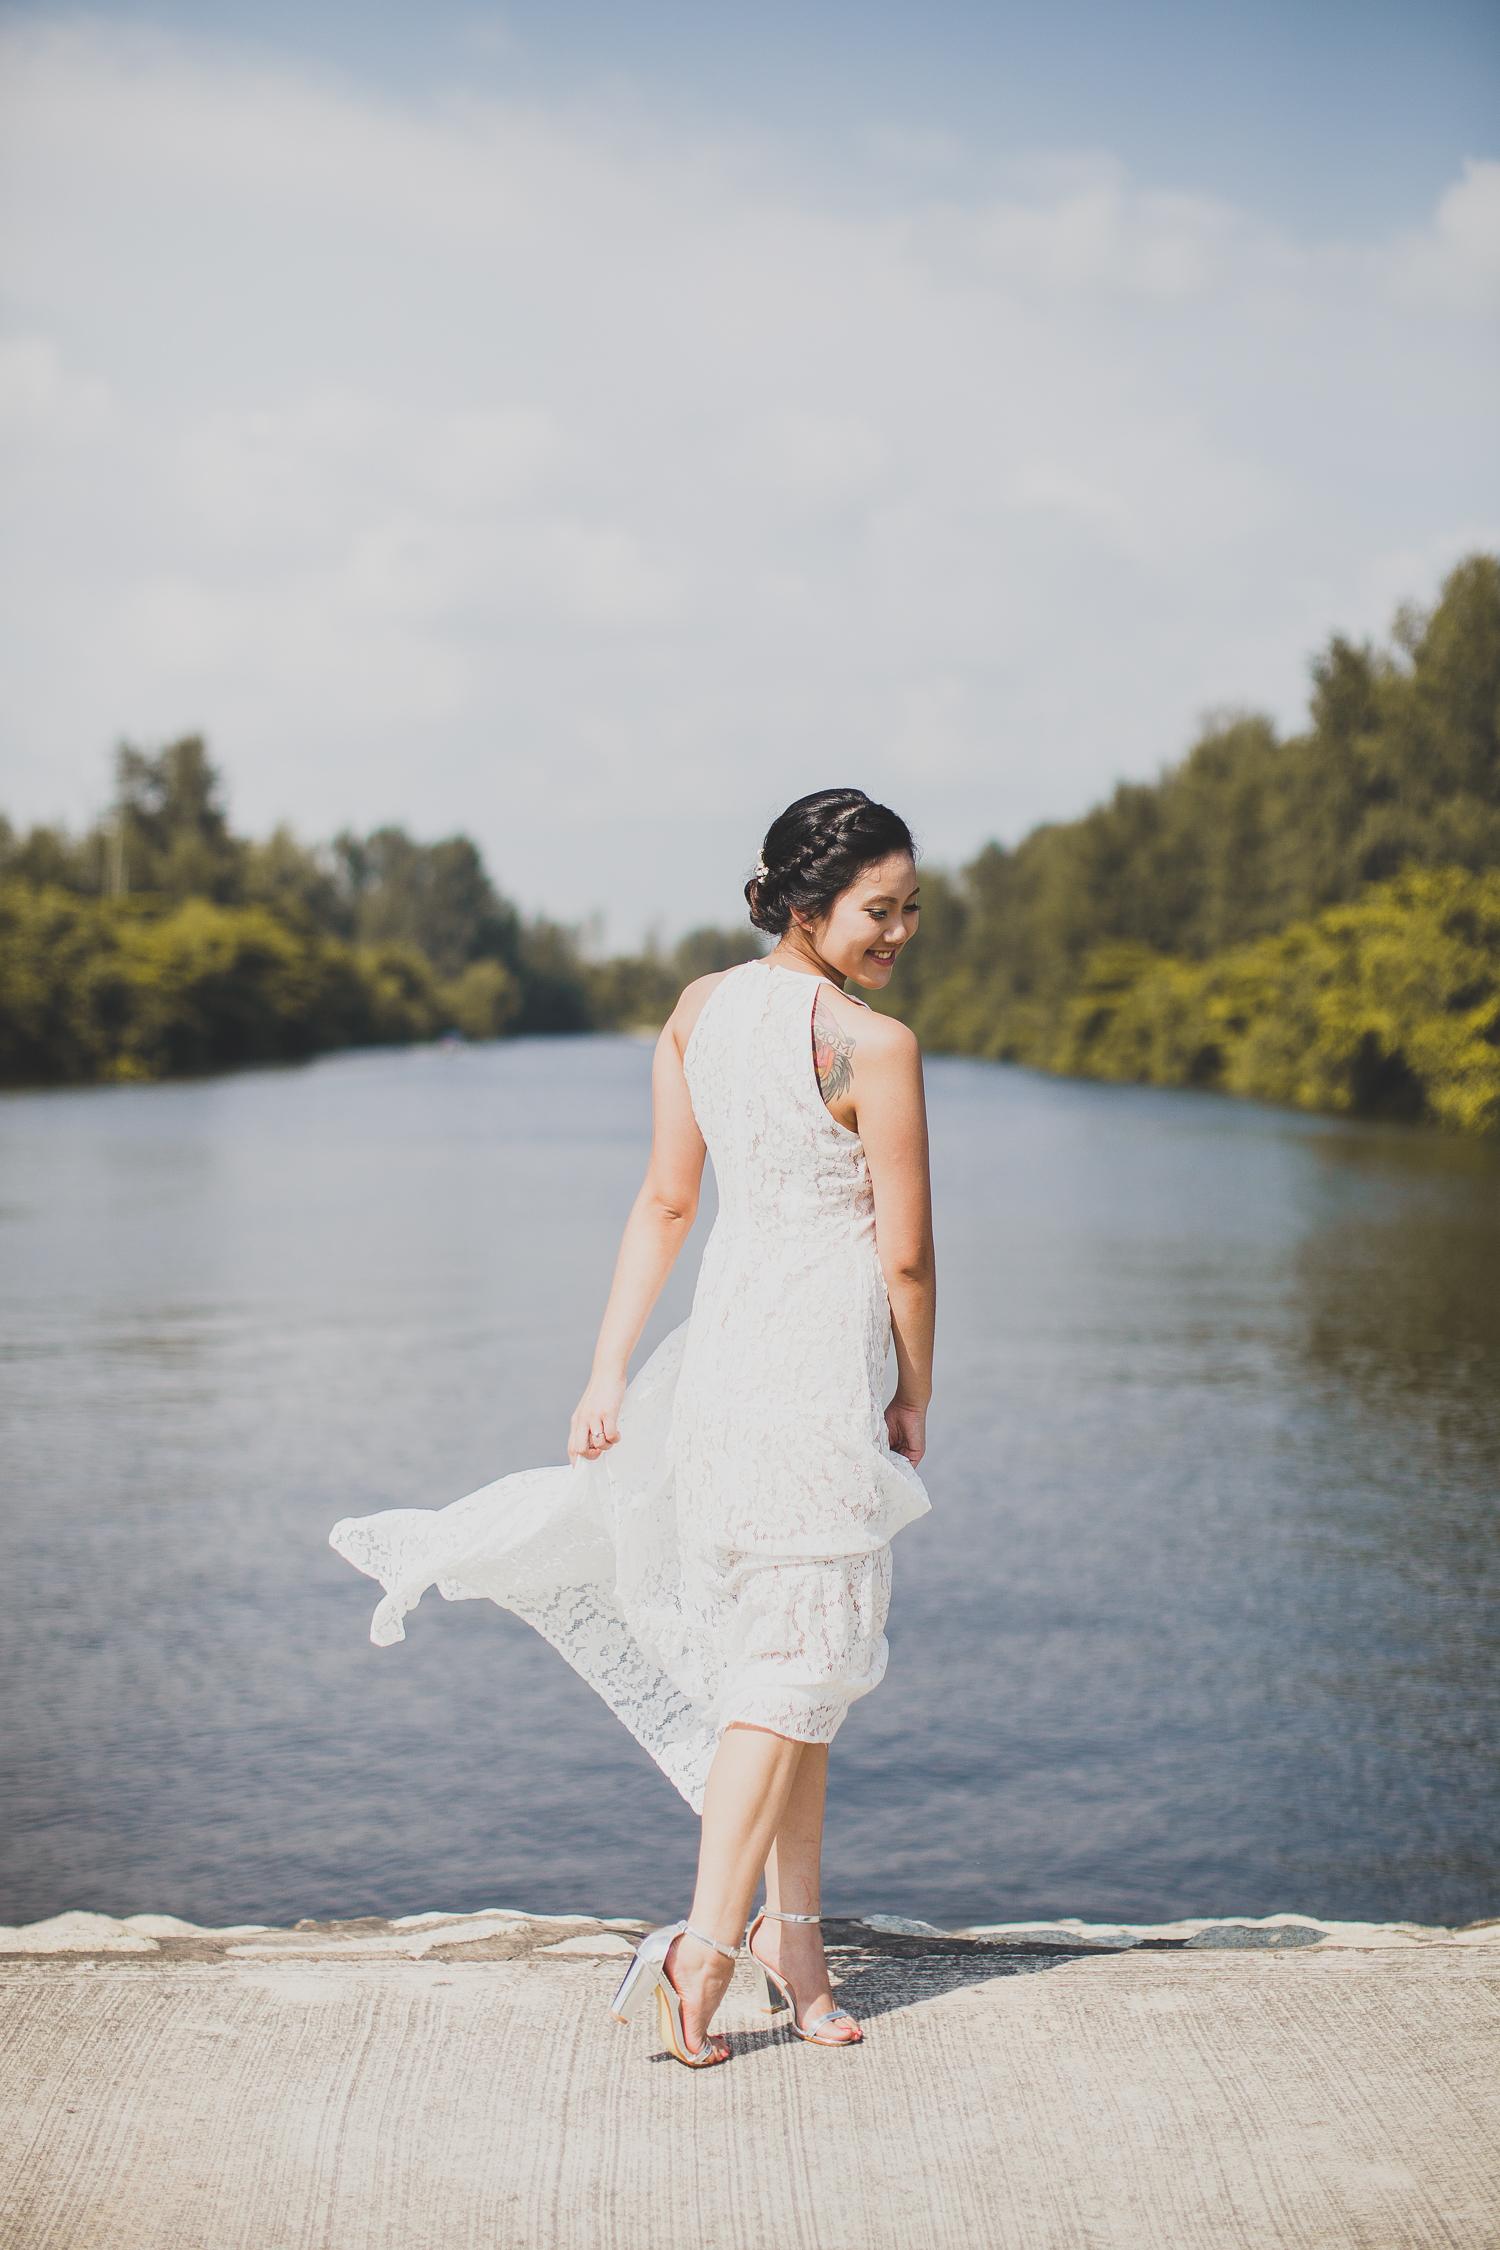 Singapore+Pre+Wedding+Photographer+Ziyang+Clara-0041.jpg